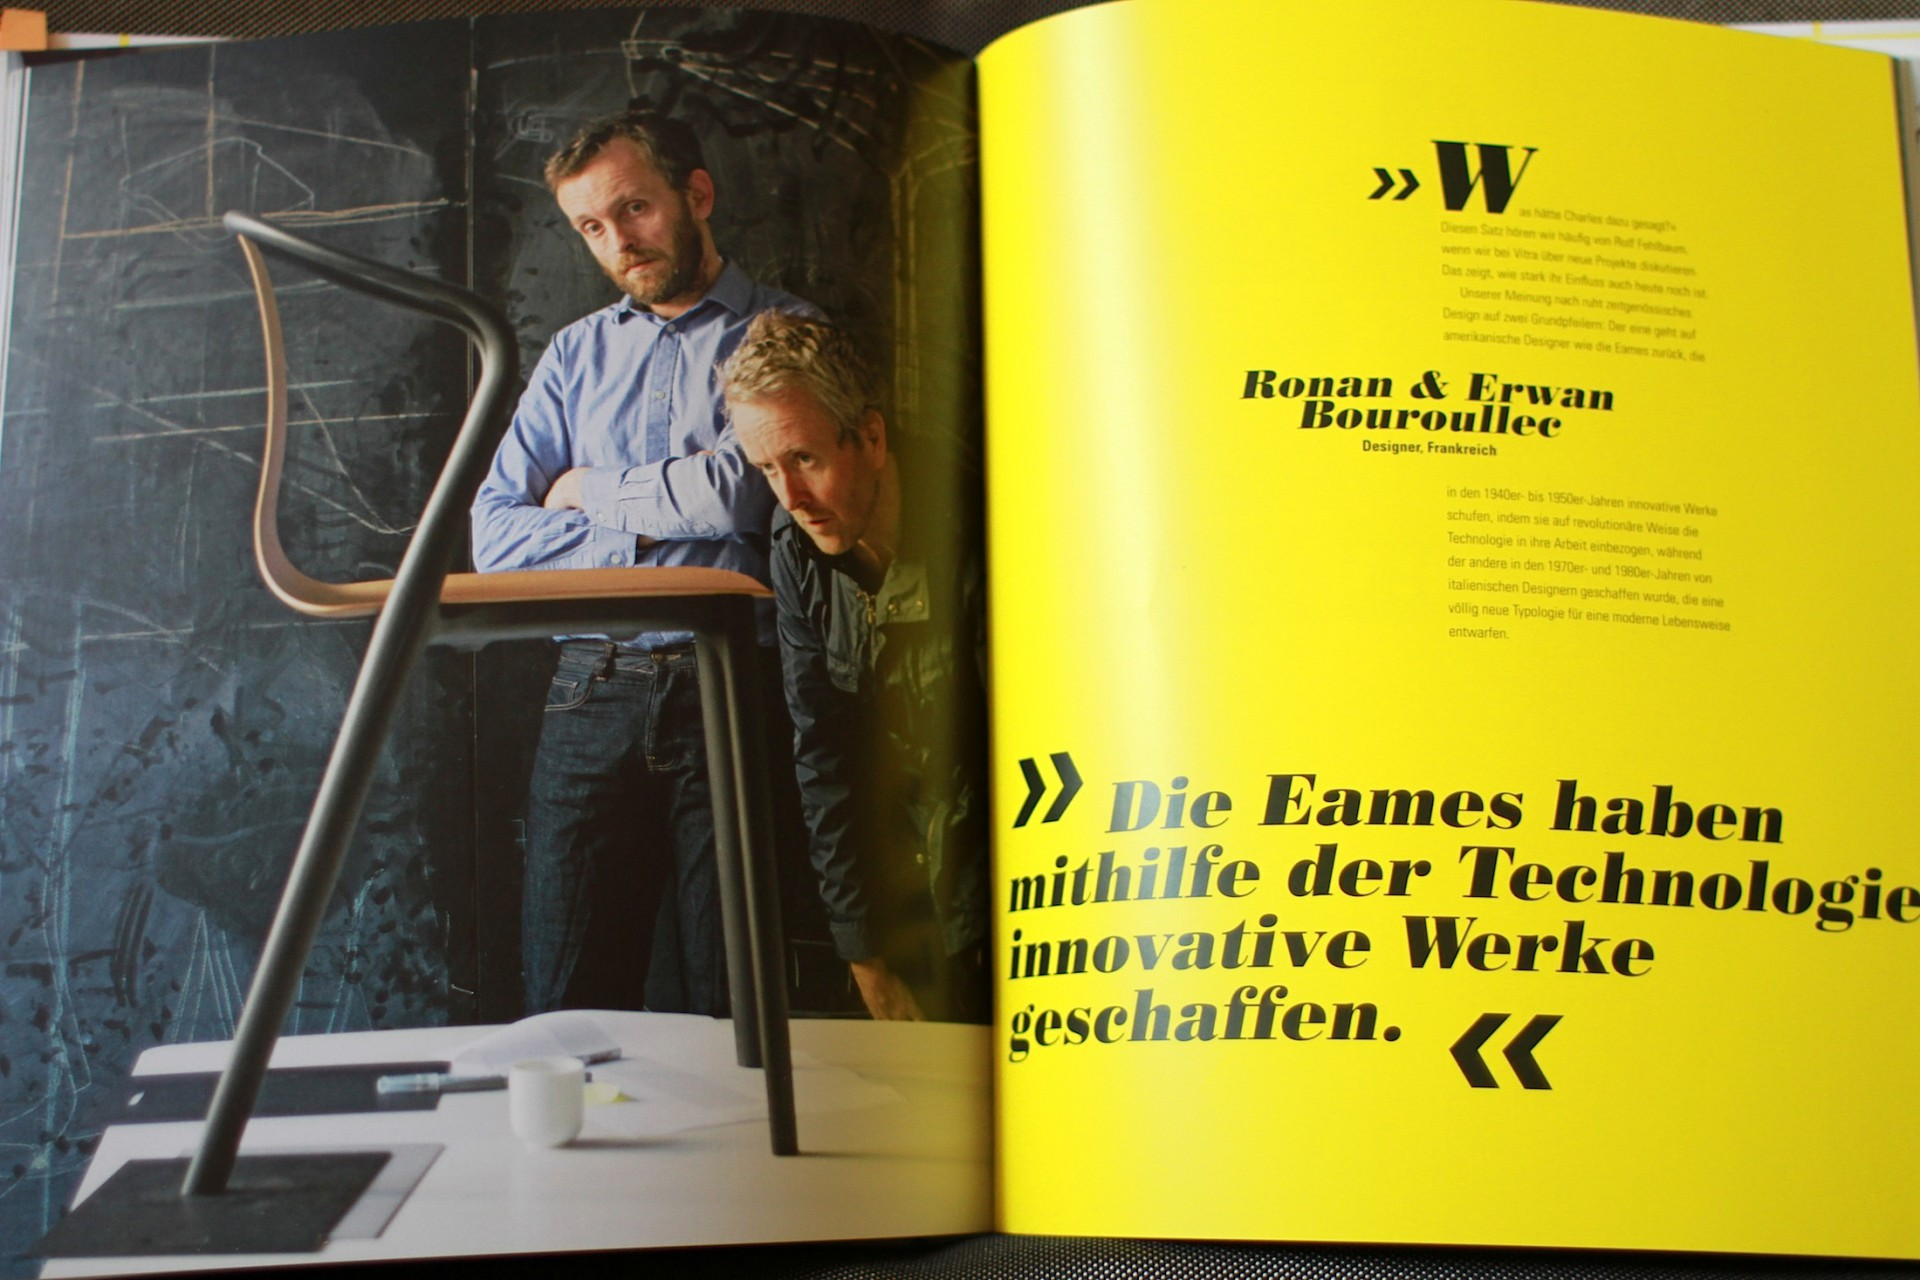 Ronan & Erwan Bouroulec, Designer, Frankreich.